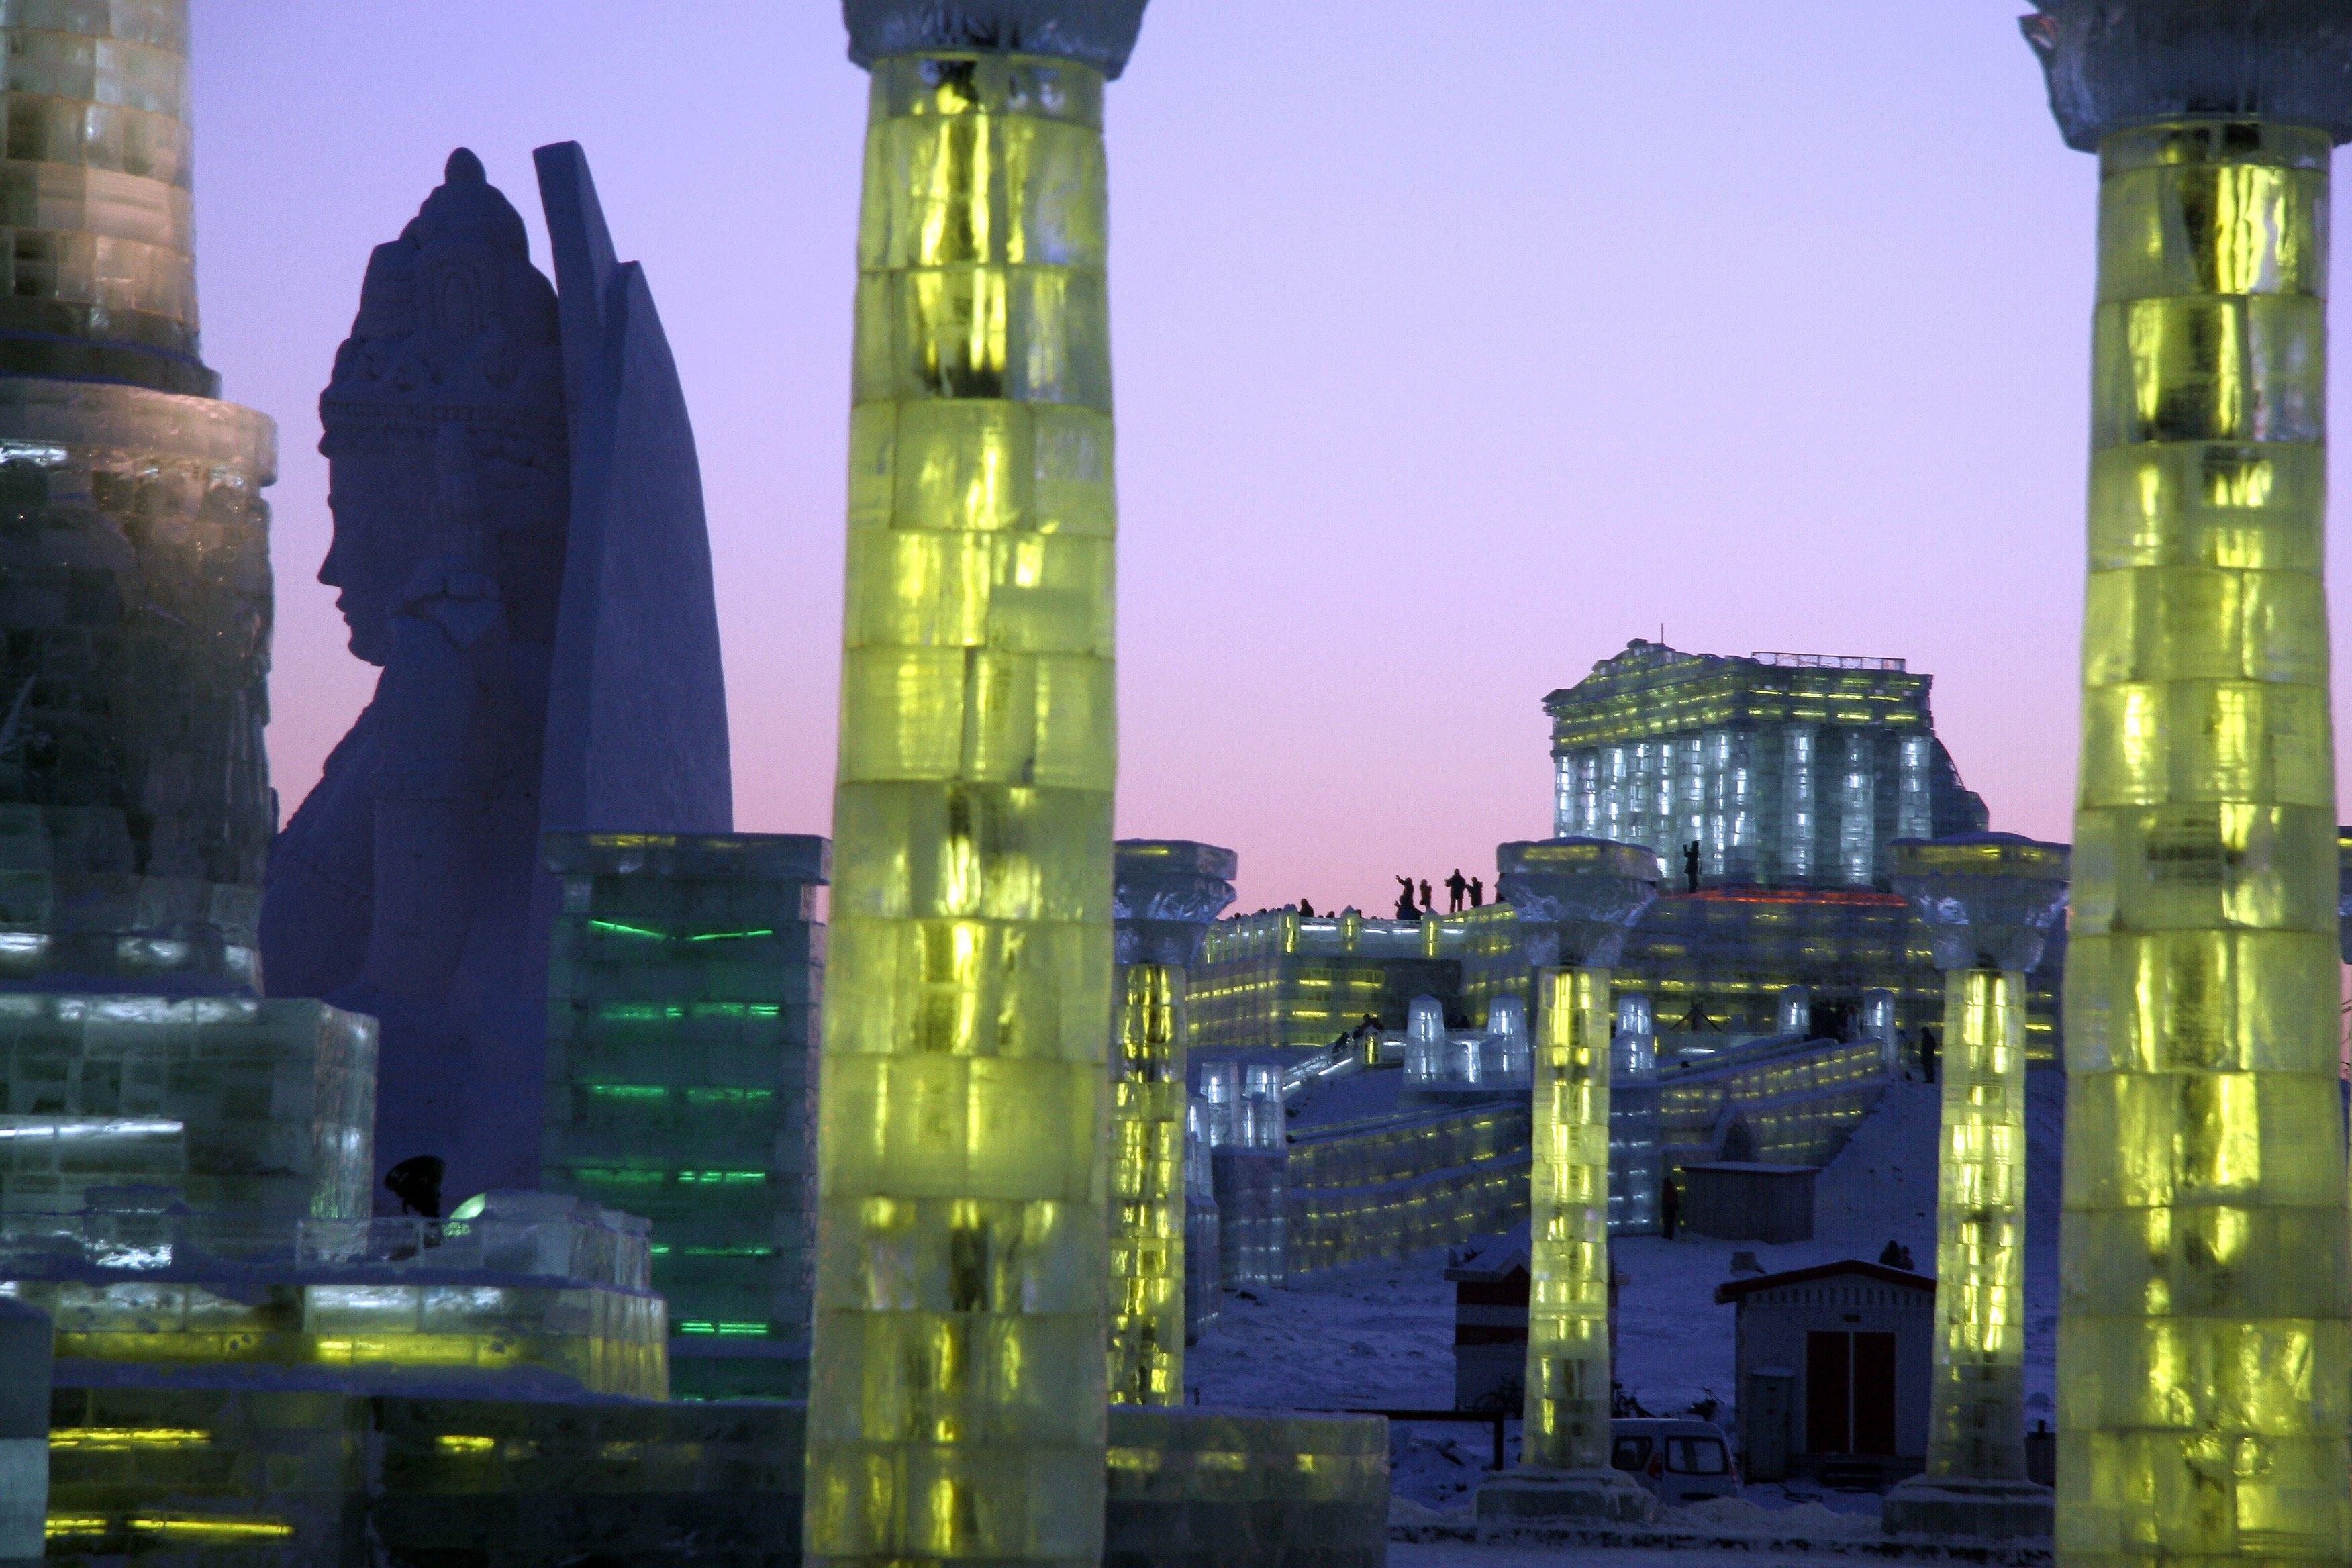 Harbin, China. Photo by Elijah Wilcott, 2008.